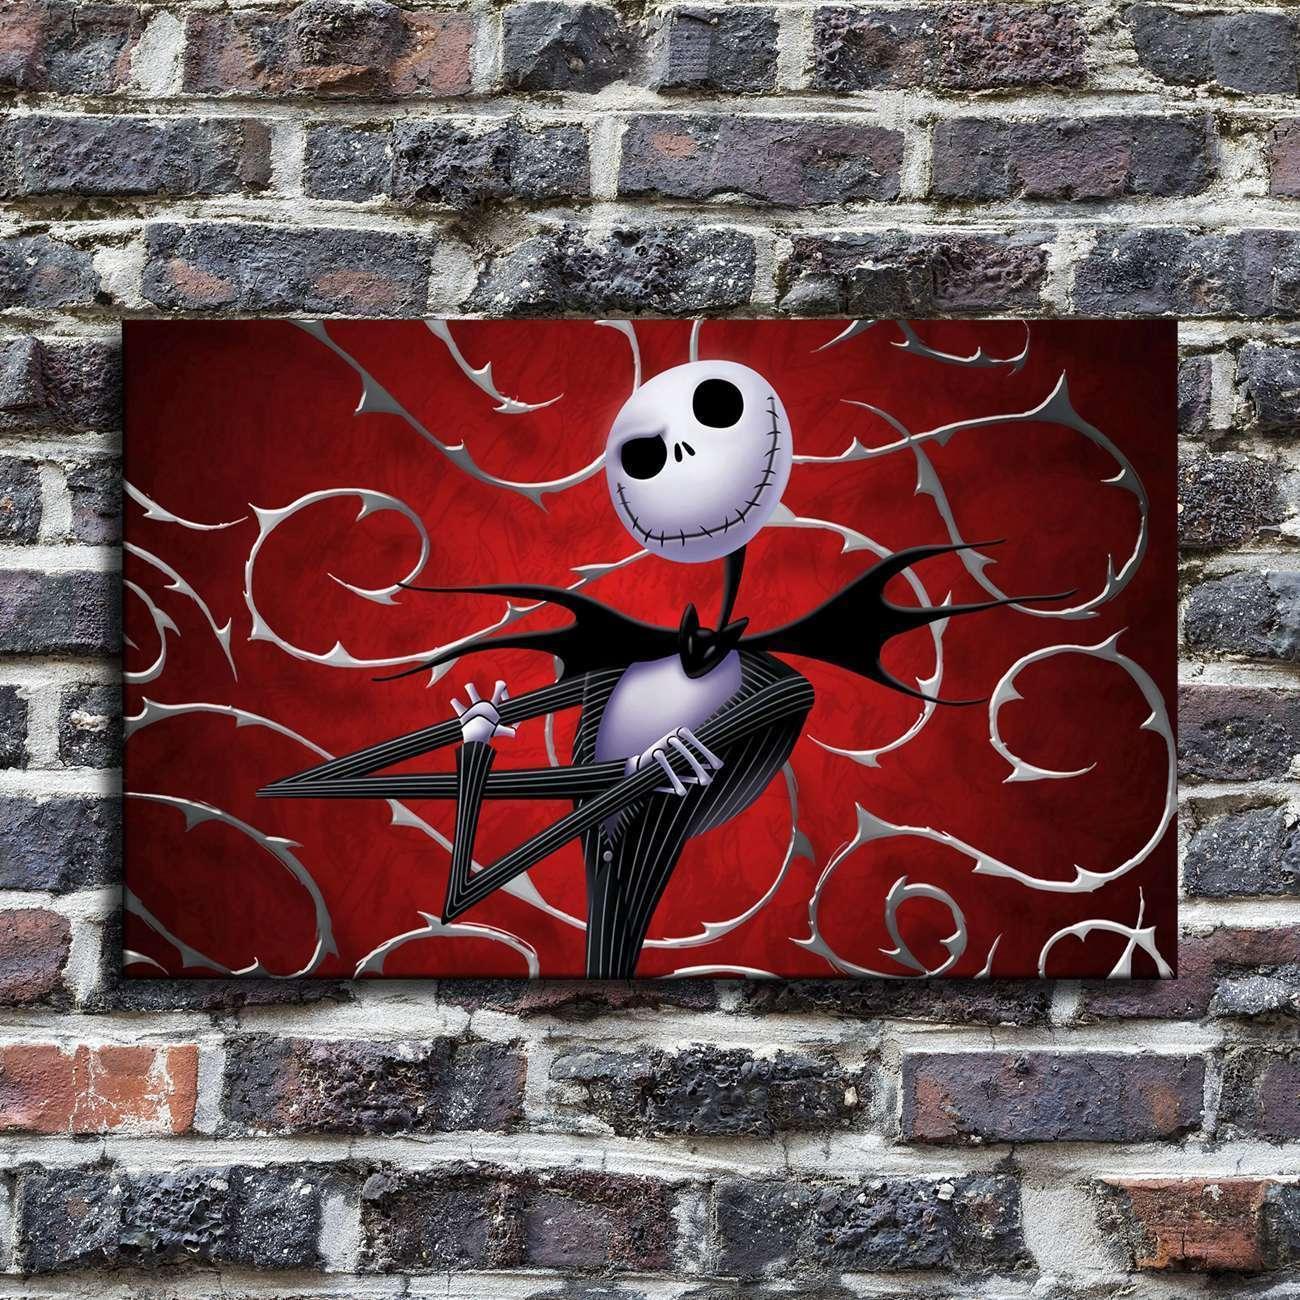 Evil Jack Skellington HD Canvas prints Painting Home Room Decor Picture Wall art